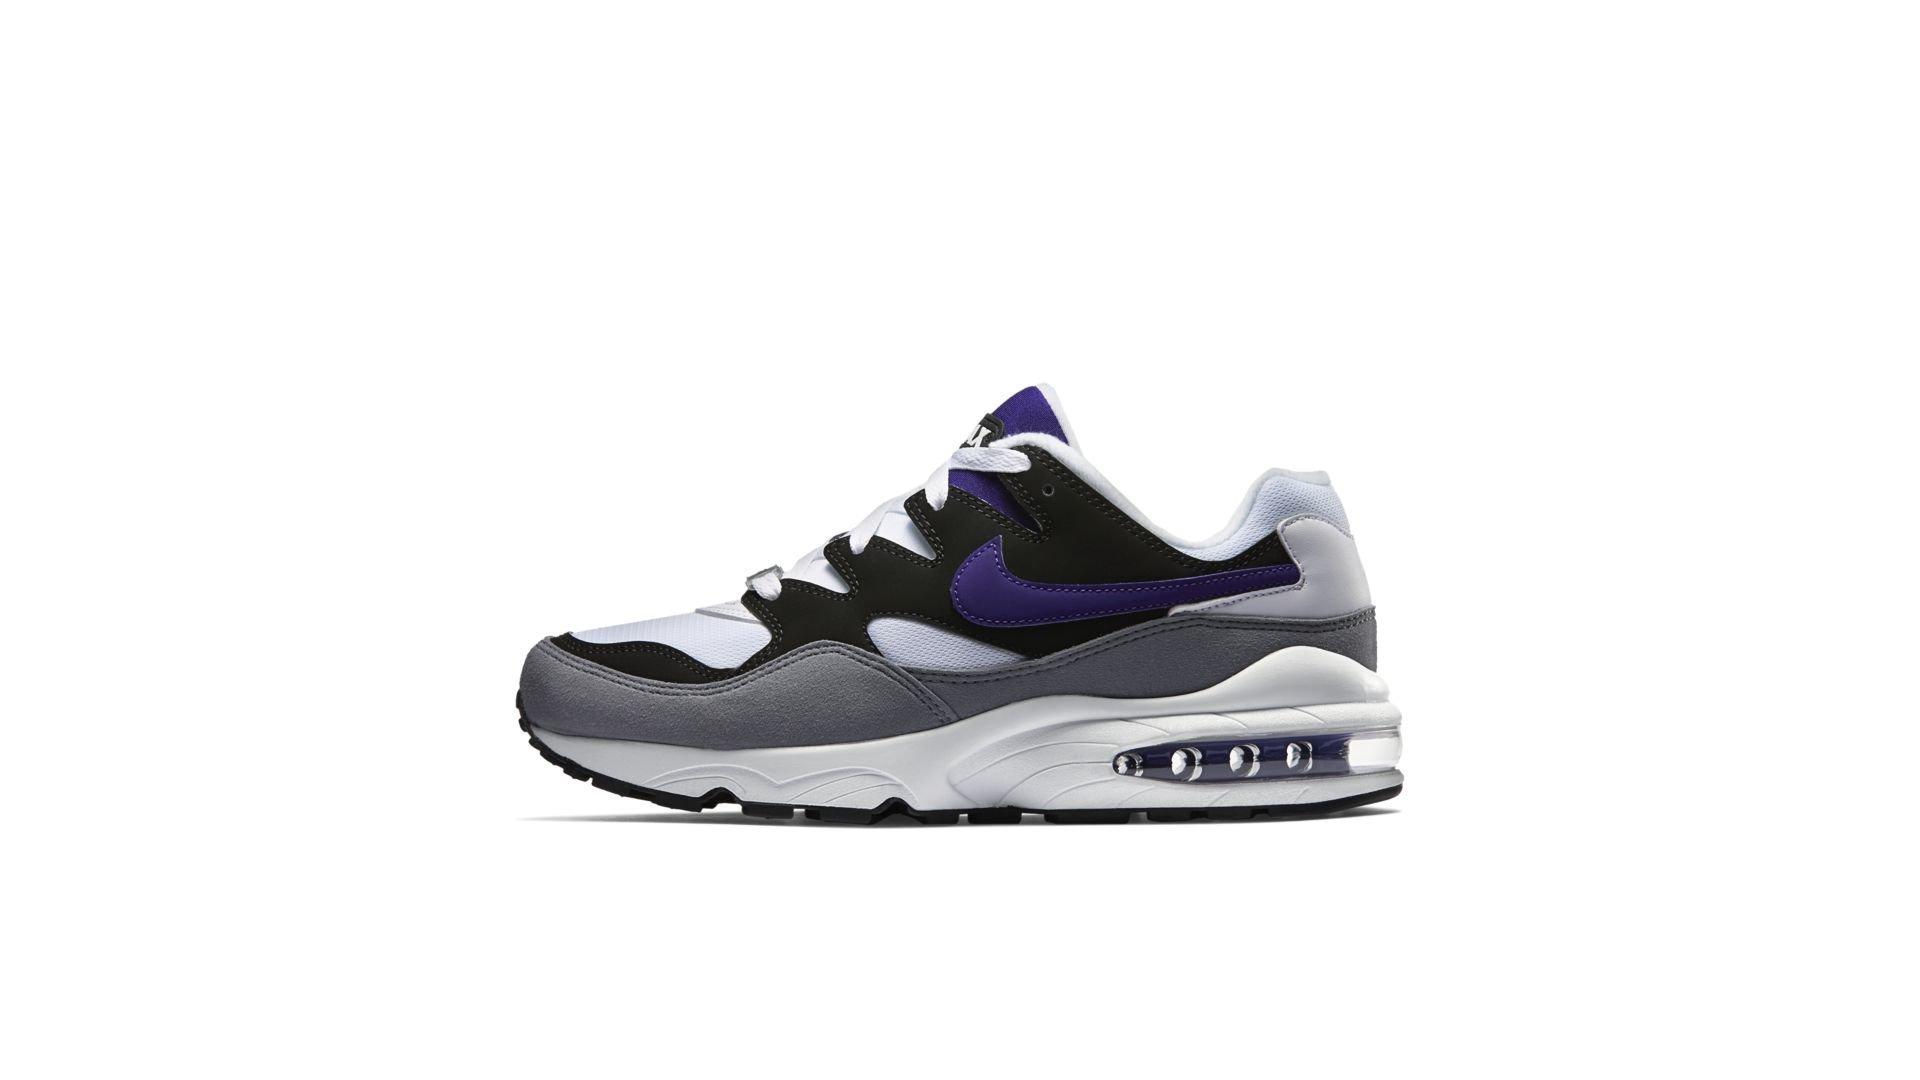 Nike Air Max 94 size? OG Purple (747997-005)